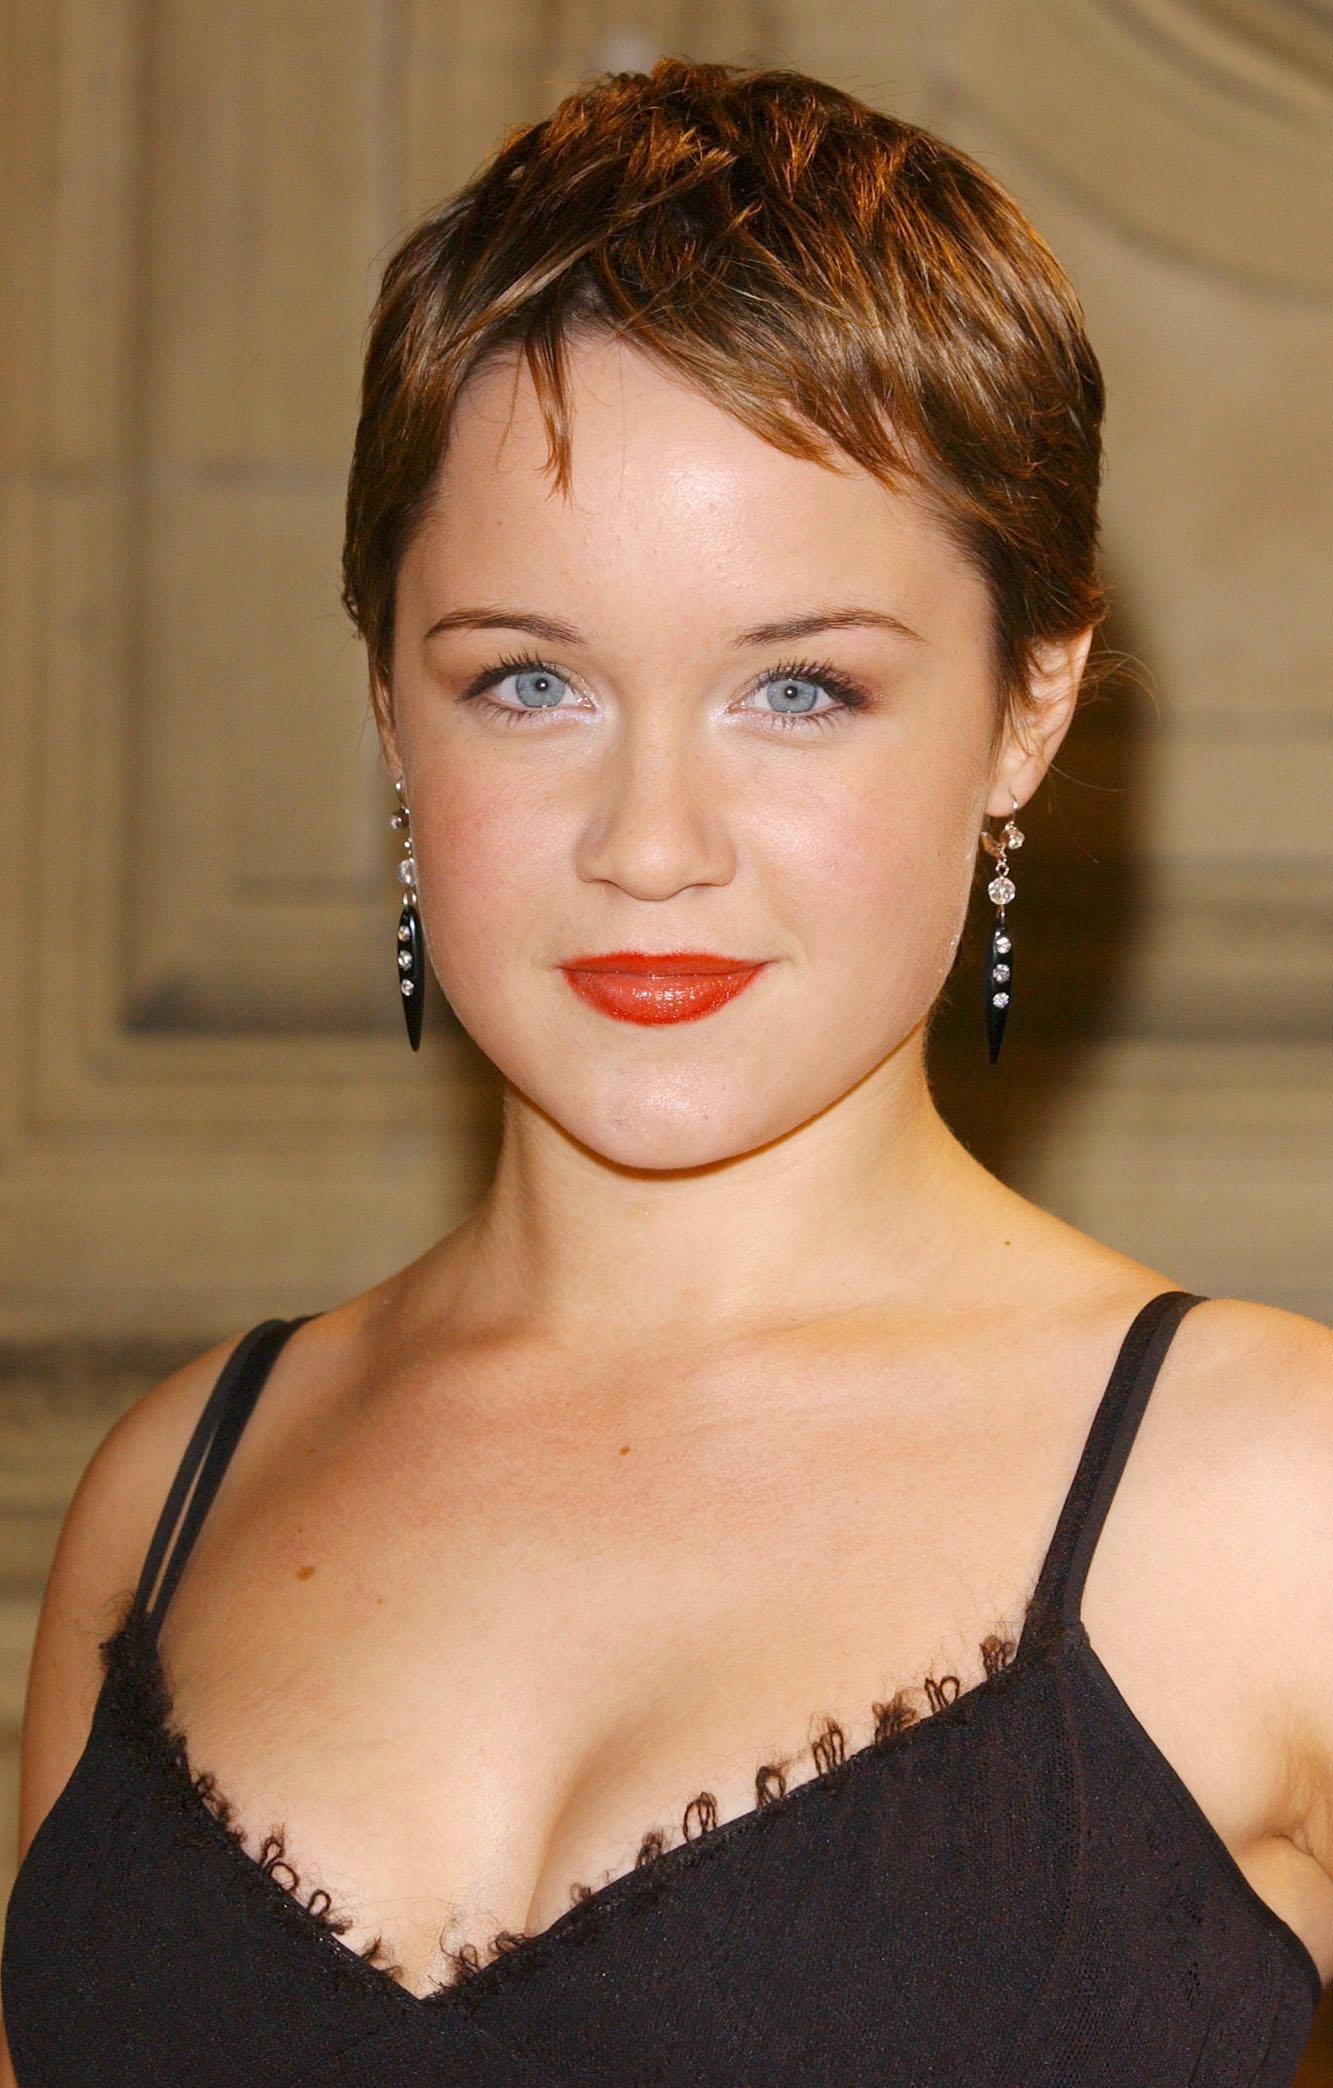 Dominic Zamprogna,Geri Halliwell Adult nude Jolene Anderson born May 26, 1980 (age 38),Hollyanne Leonard (it CAN 1 1999